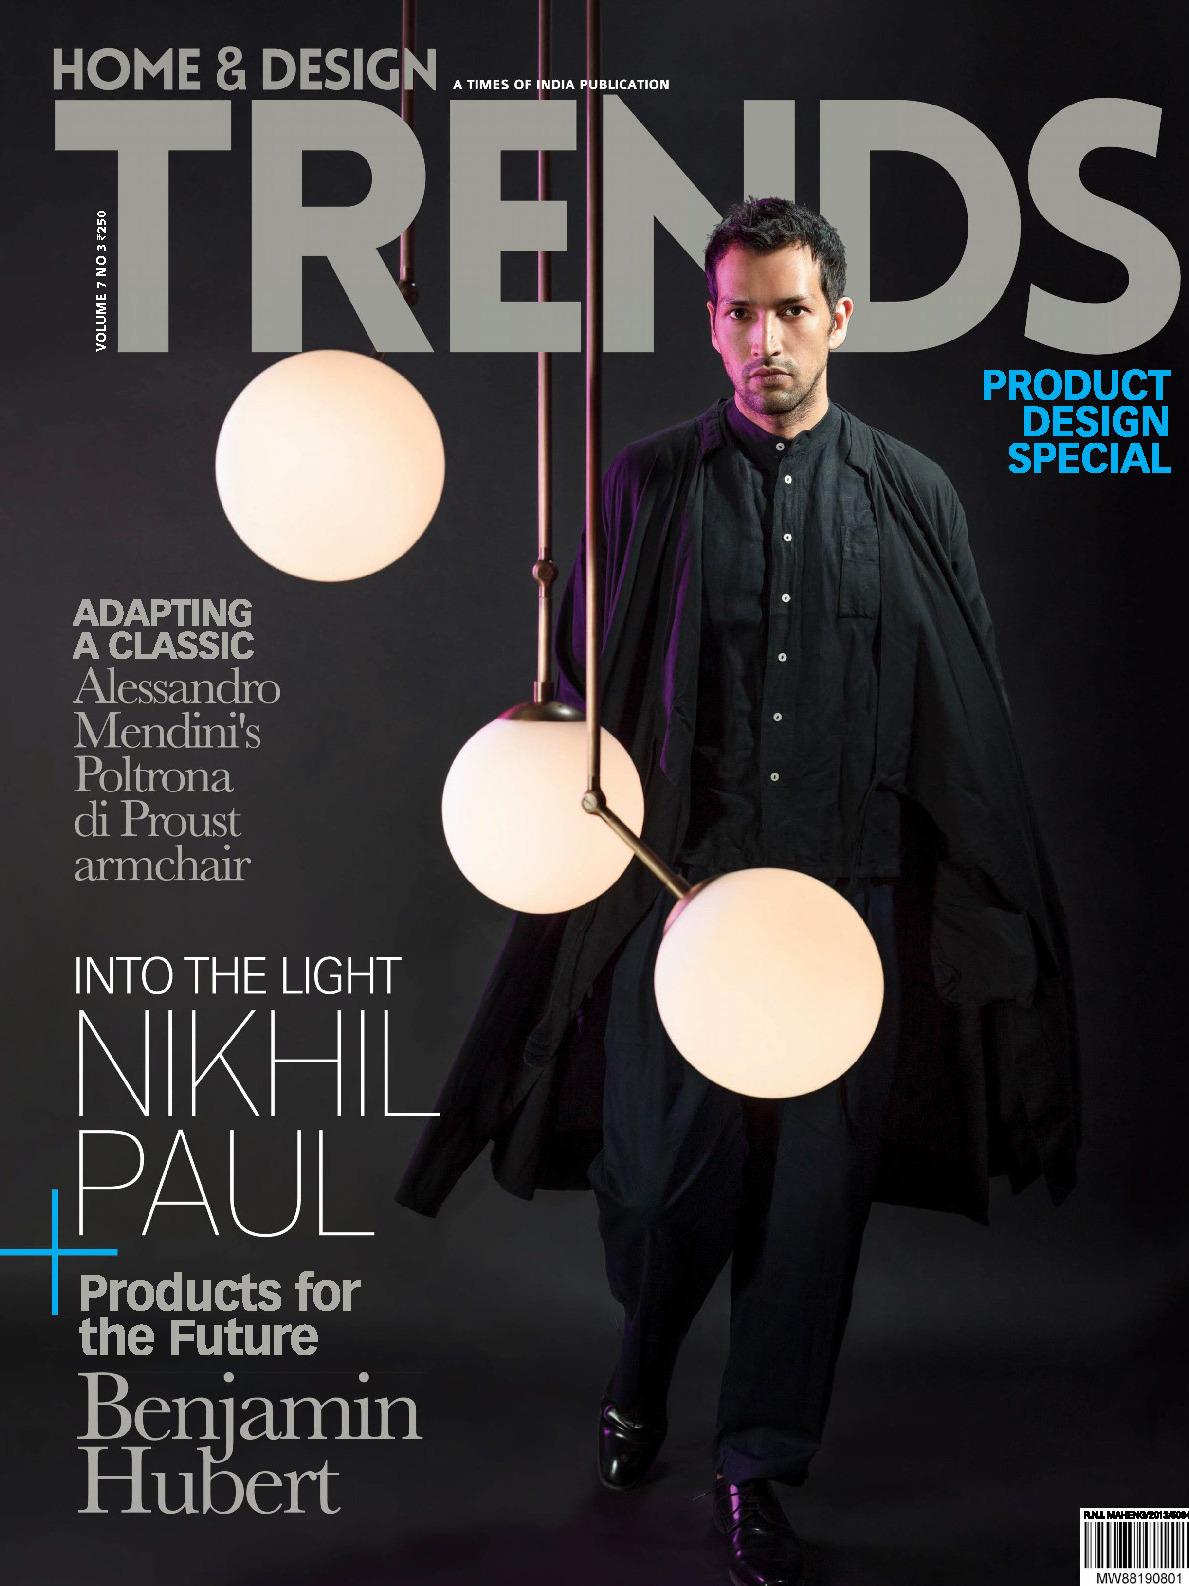 《Home & Design Trends》英国版室内设计杂志2019年08月号